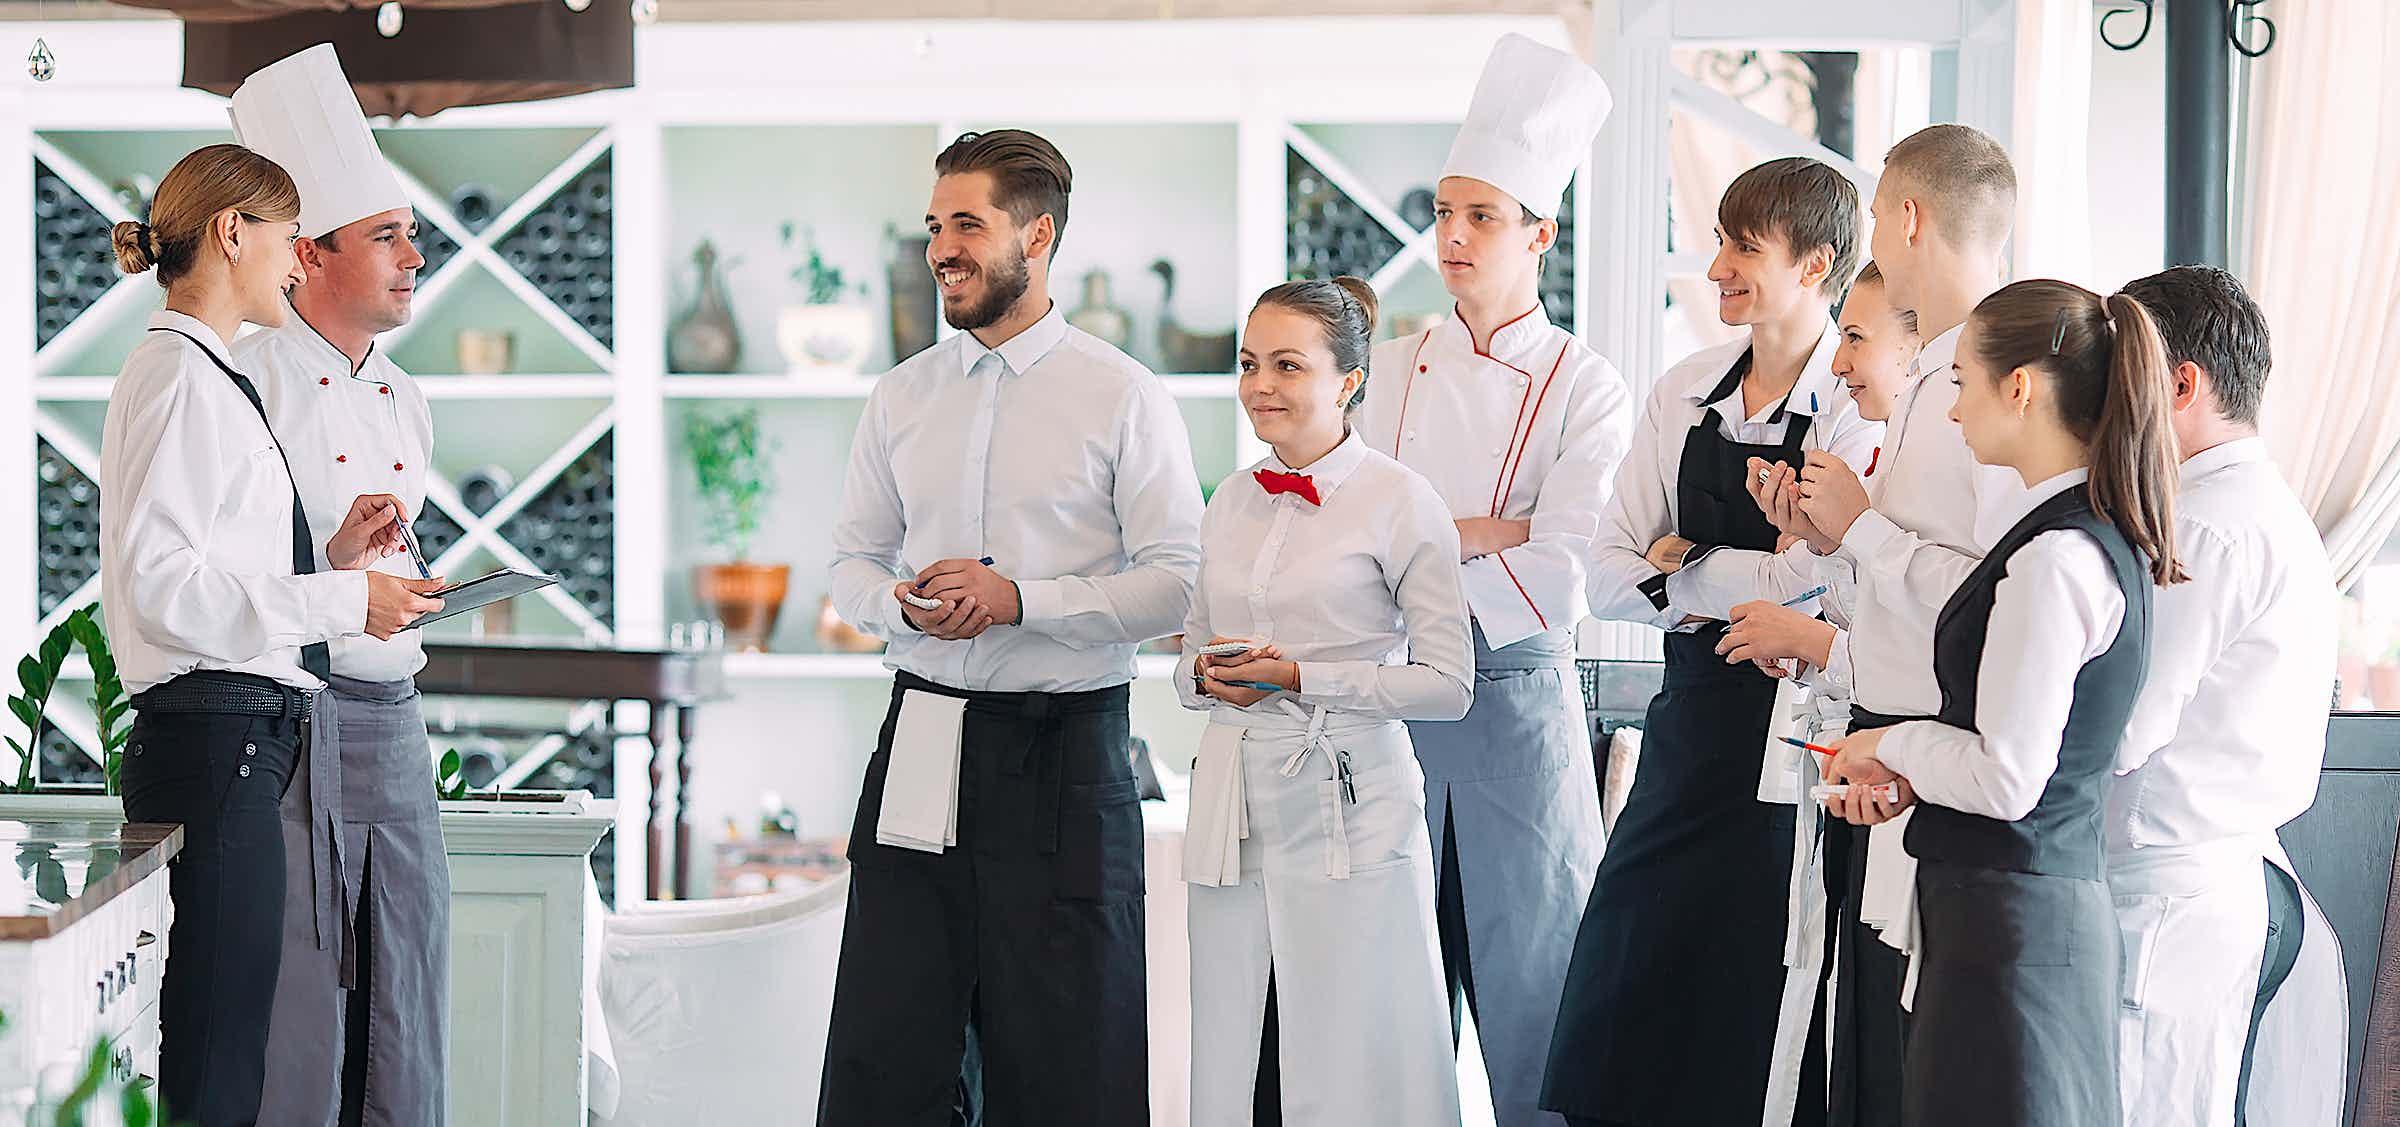 Gastro-Personal begrüßt neuen Kollegen